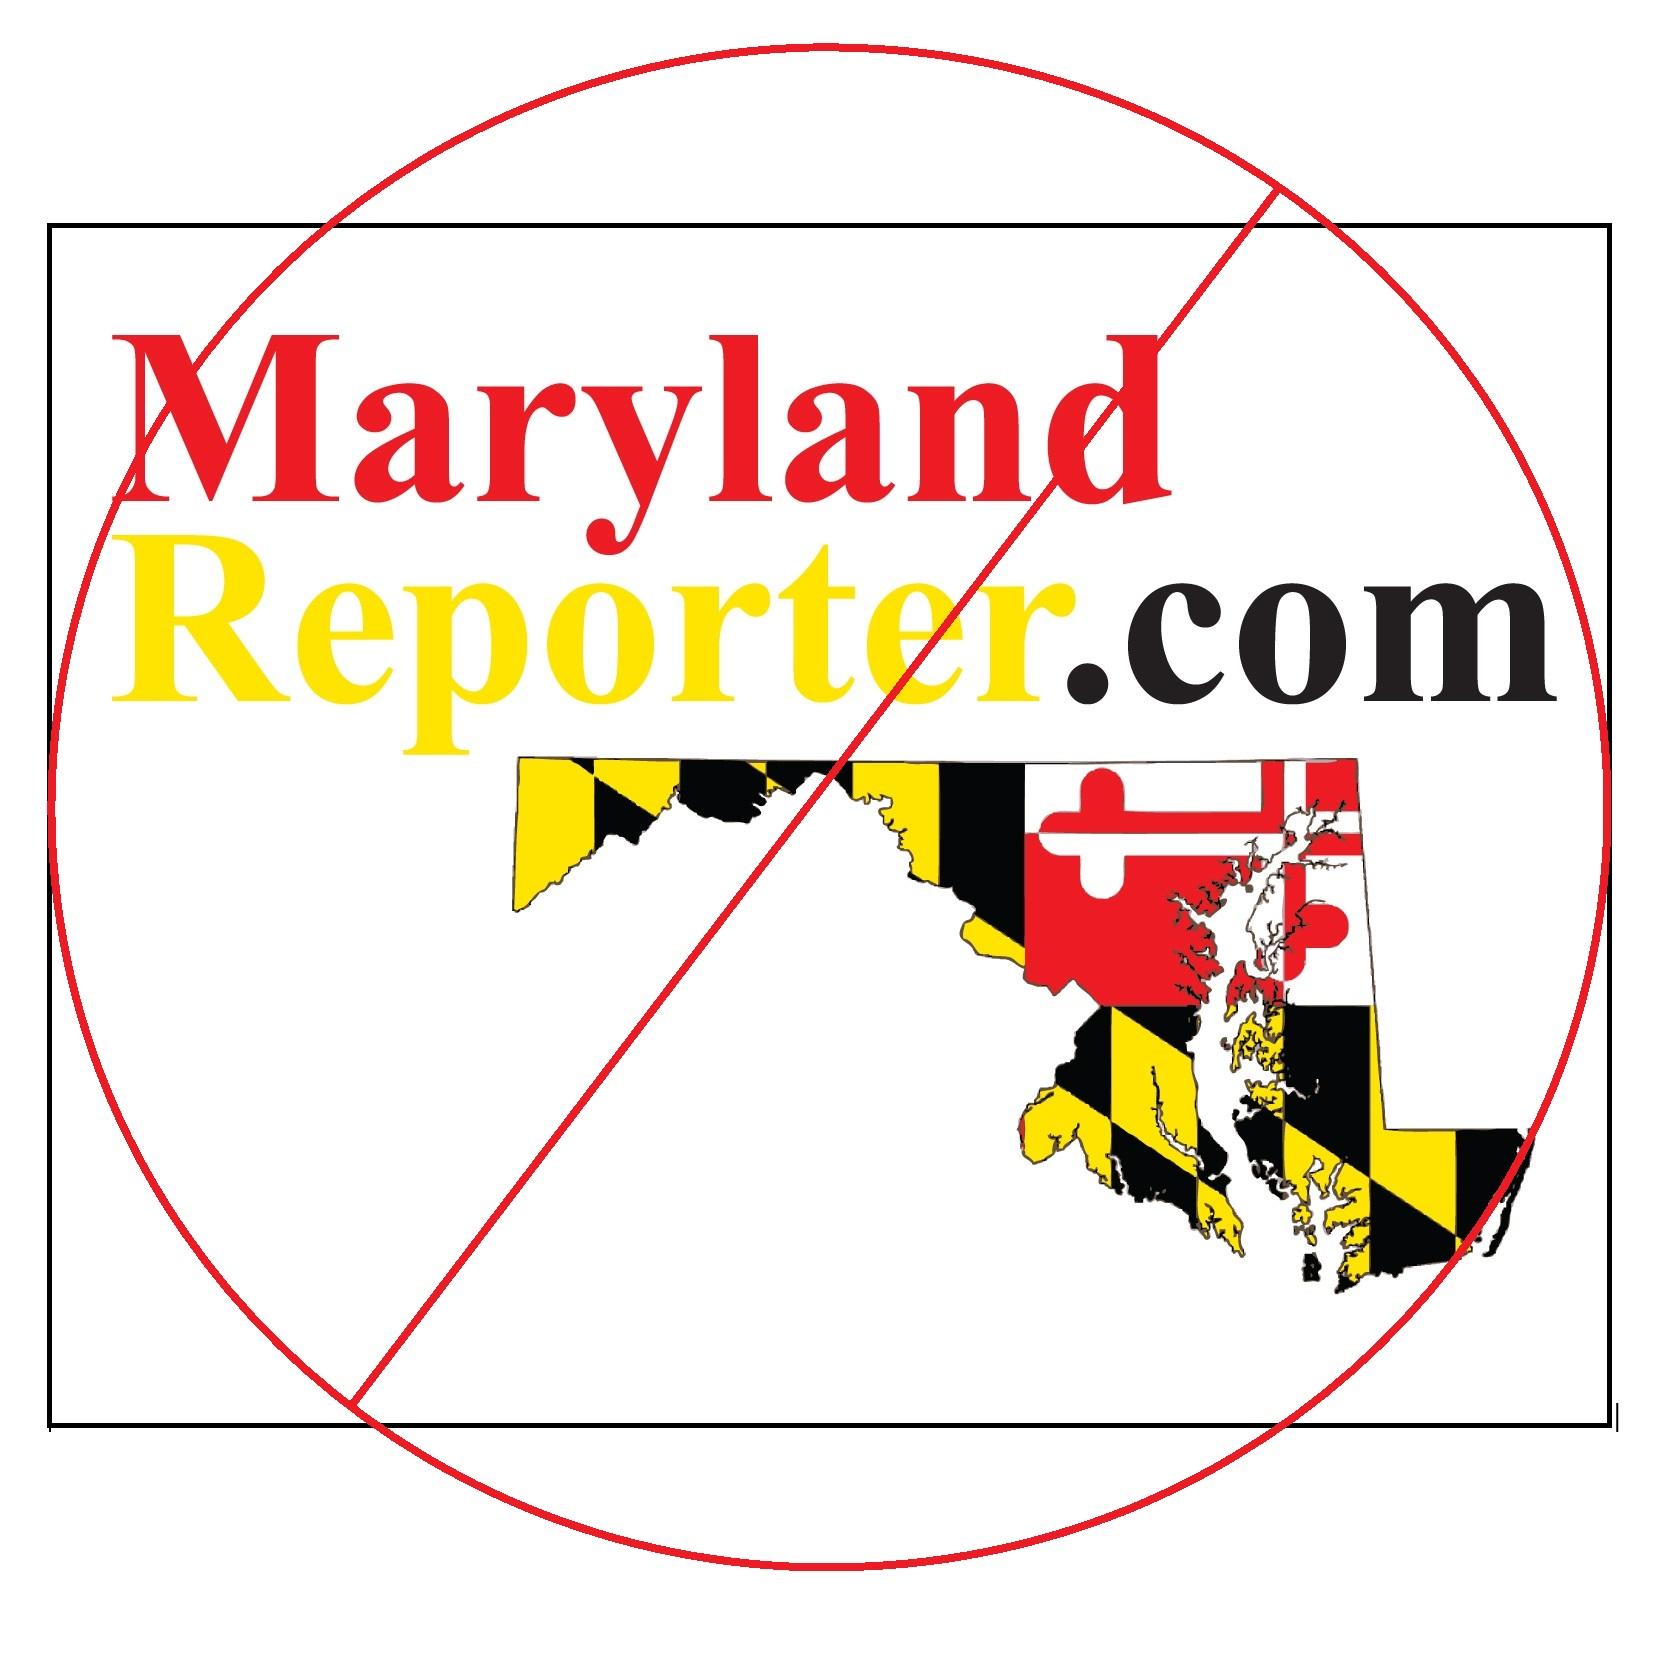 Blowback on Rascovar column was fierce; Bongino calls for boycott of Maryland Reporter